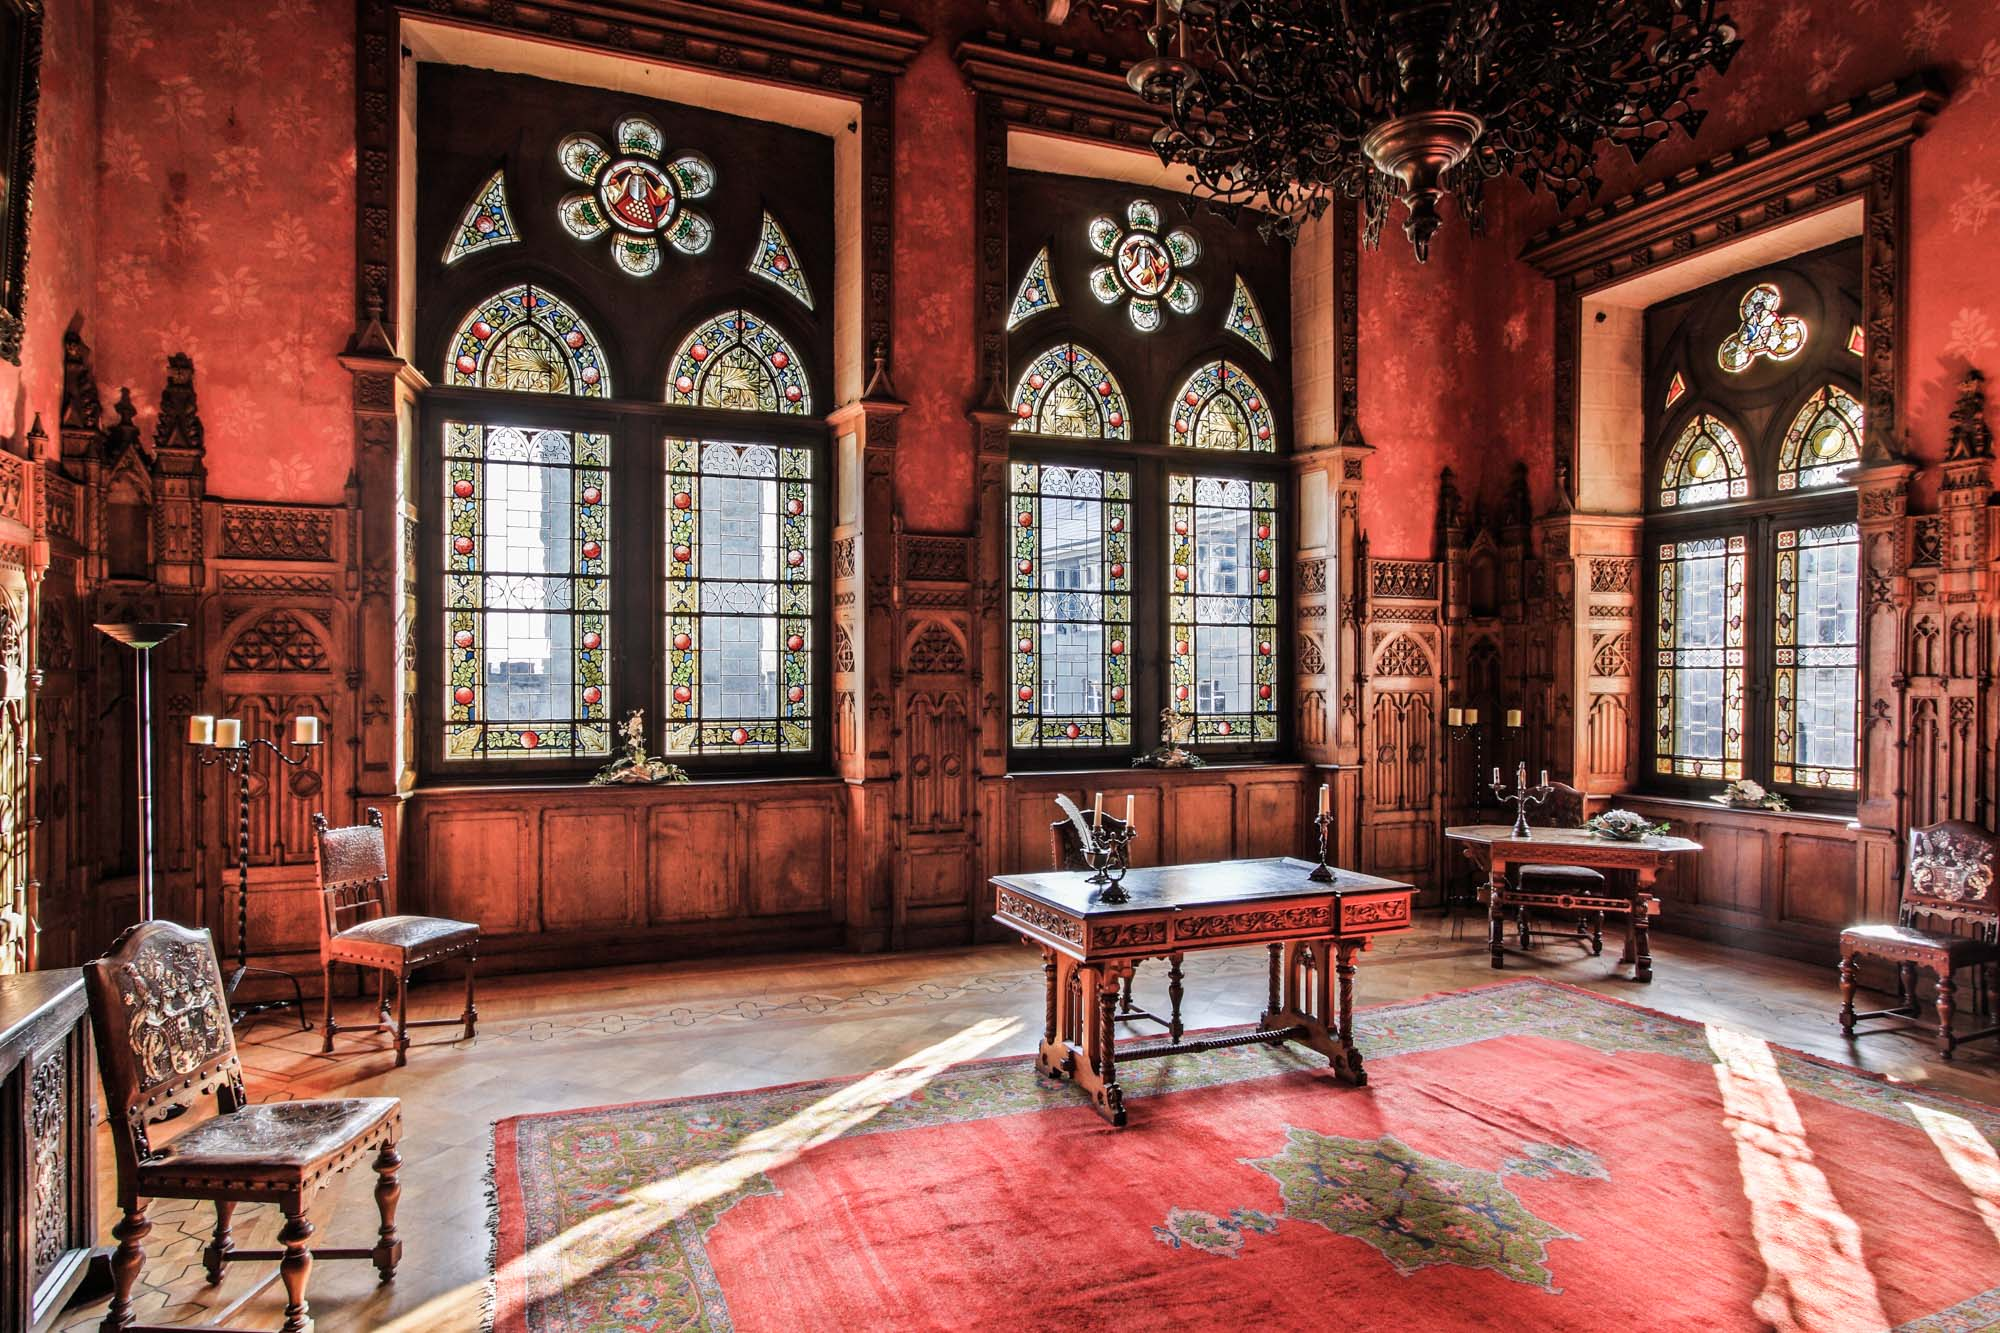 The Ernst-August-Saal inside Bentheim Castle © Thomas Wallenmeyer